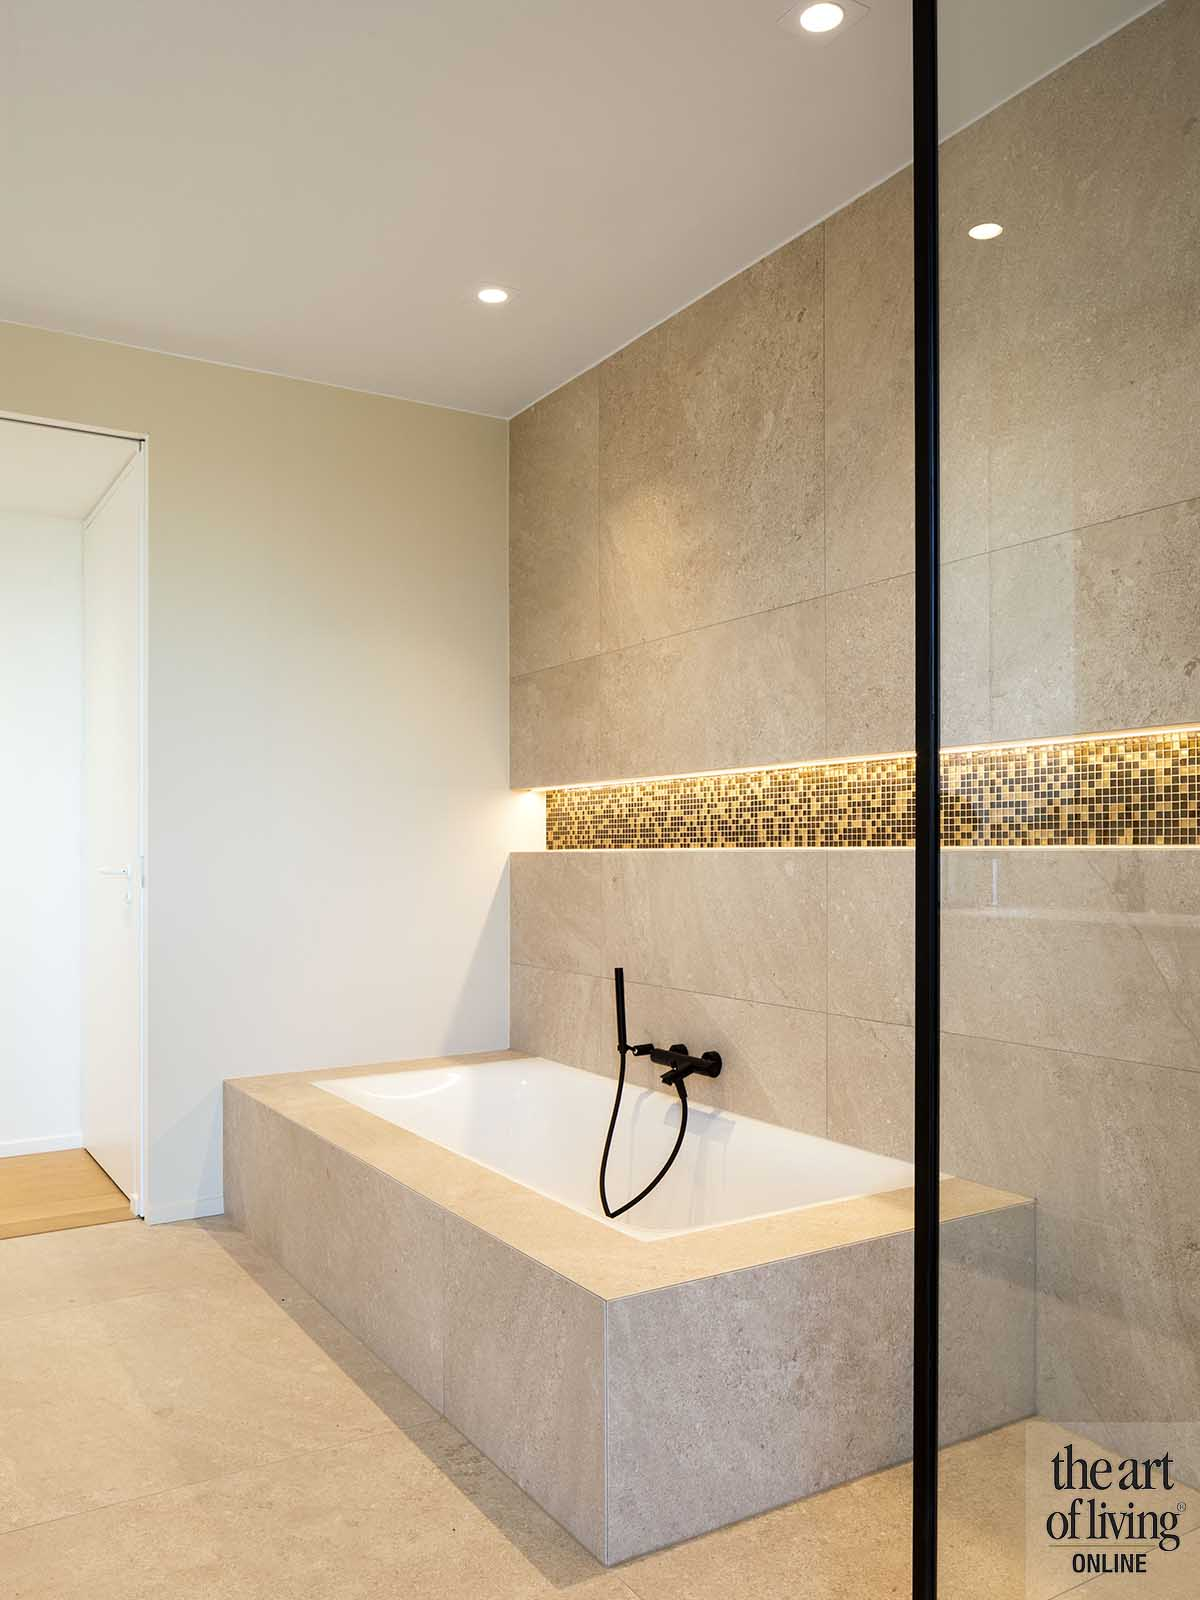 warm interieur | OH Architecten, the art of living